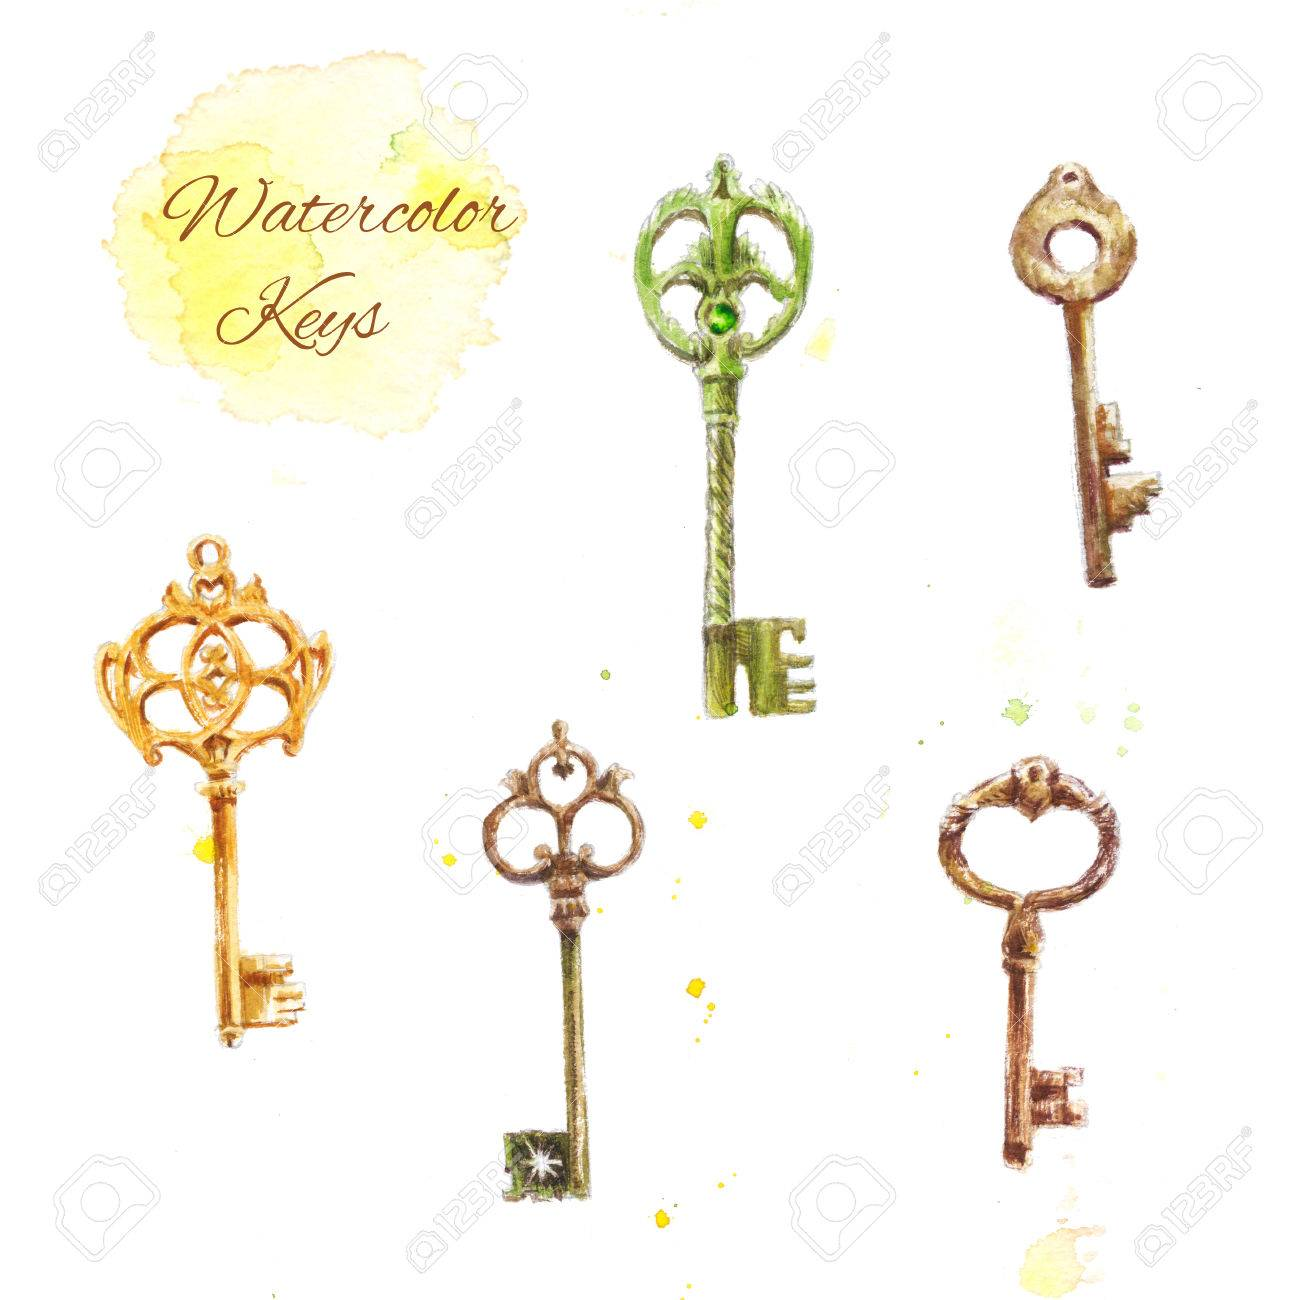 1300x1300 Set Of Watercolor Keys, Vintage Drawing Of Five Keys Stock Photo